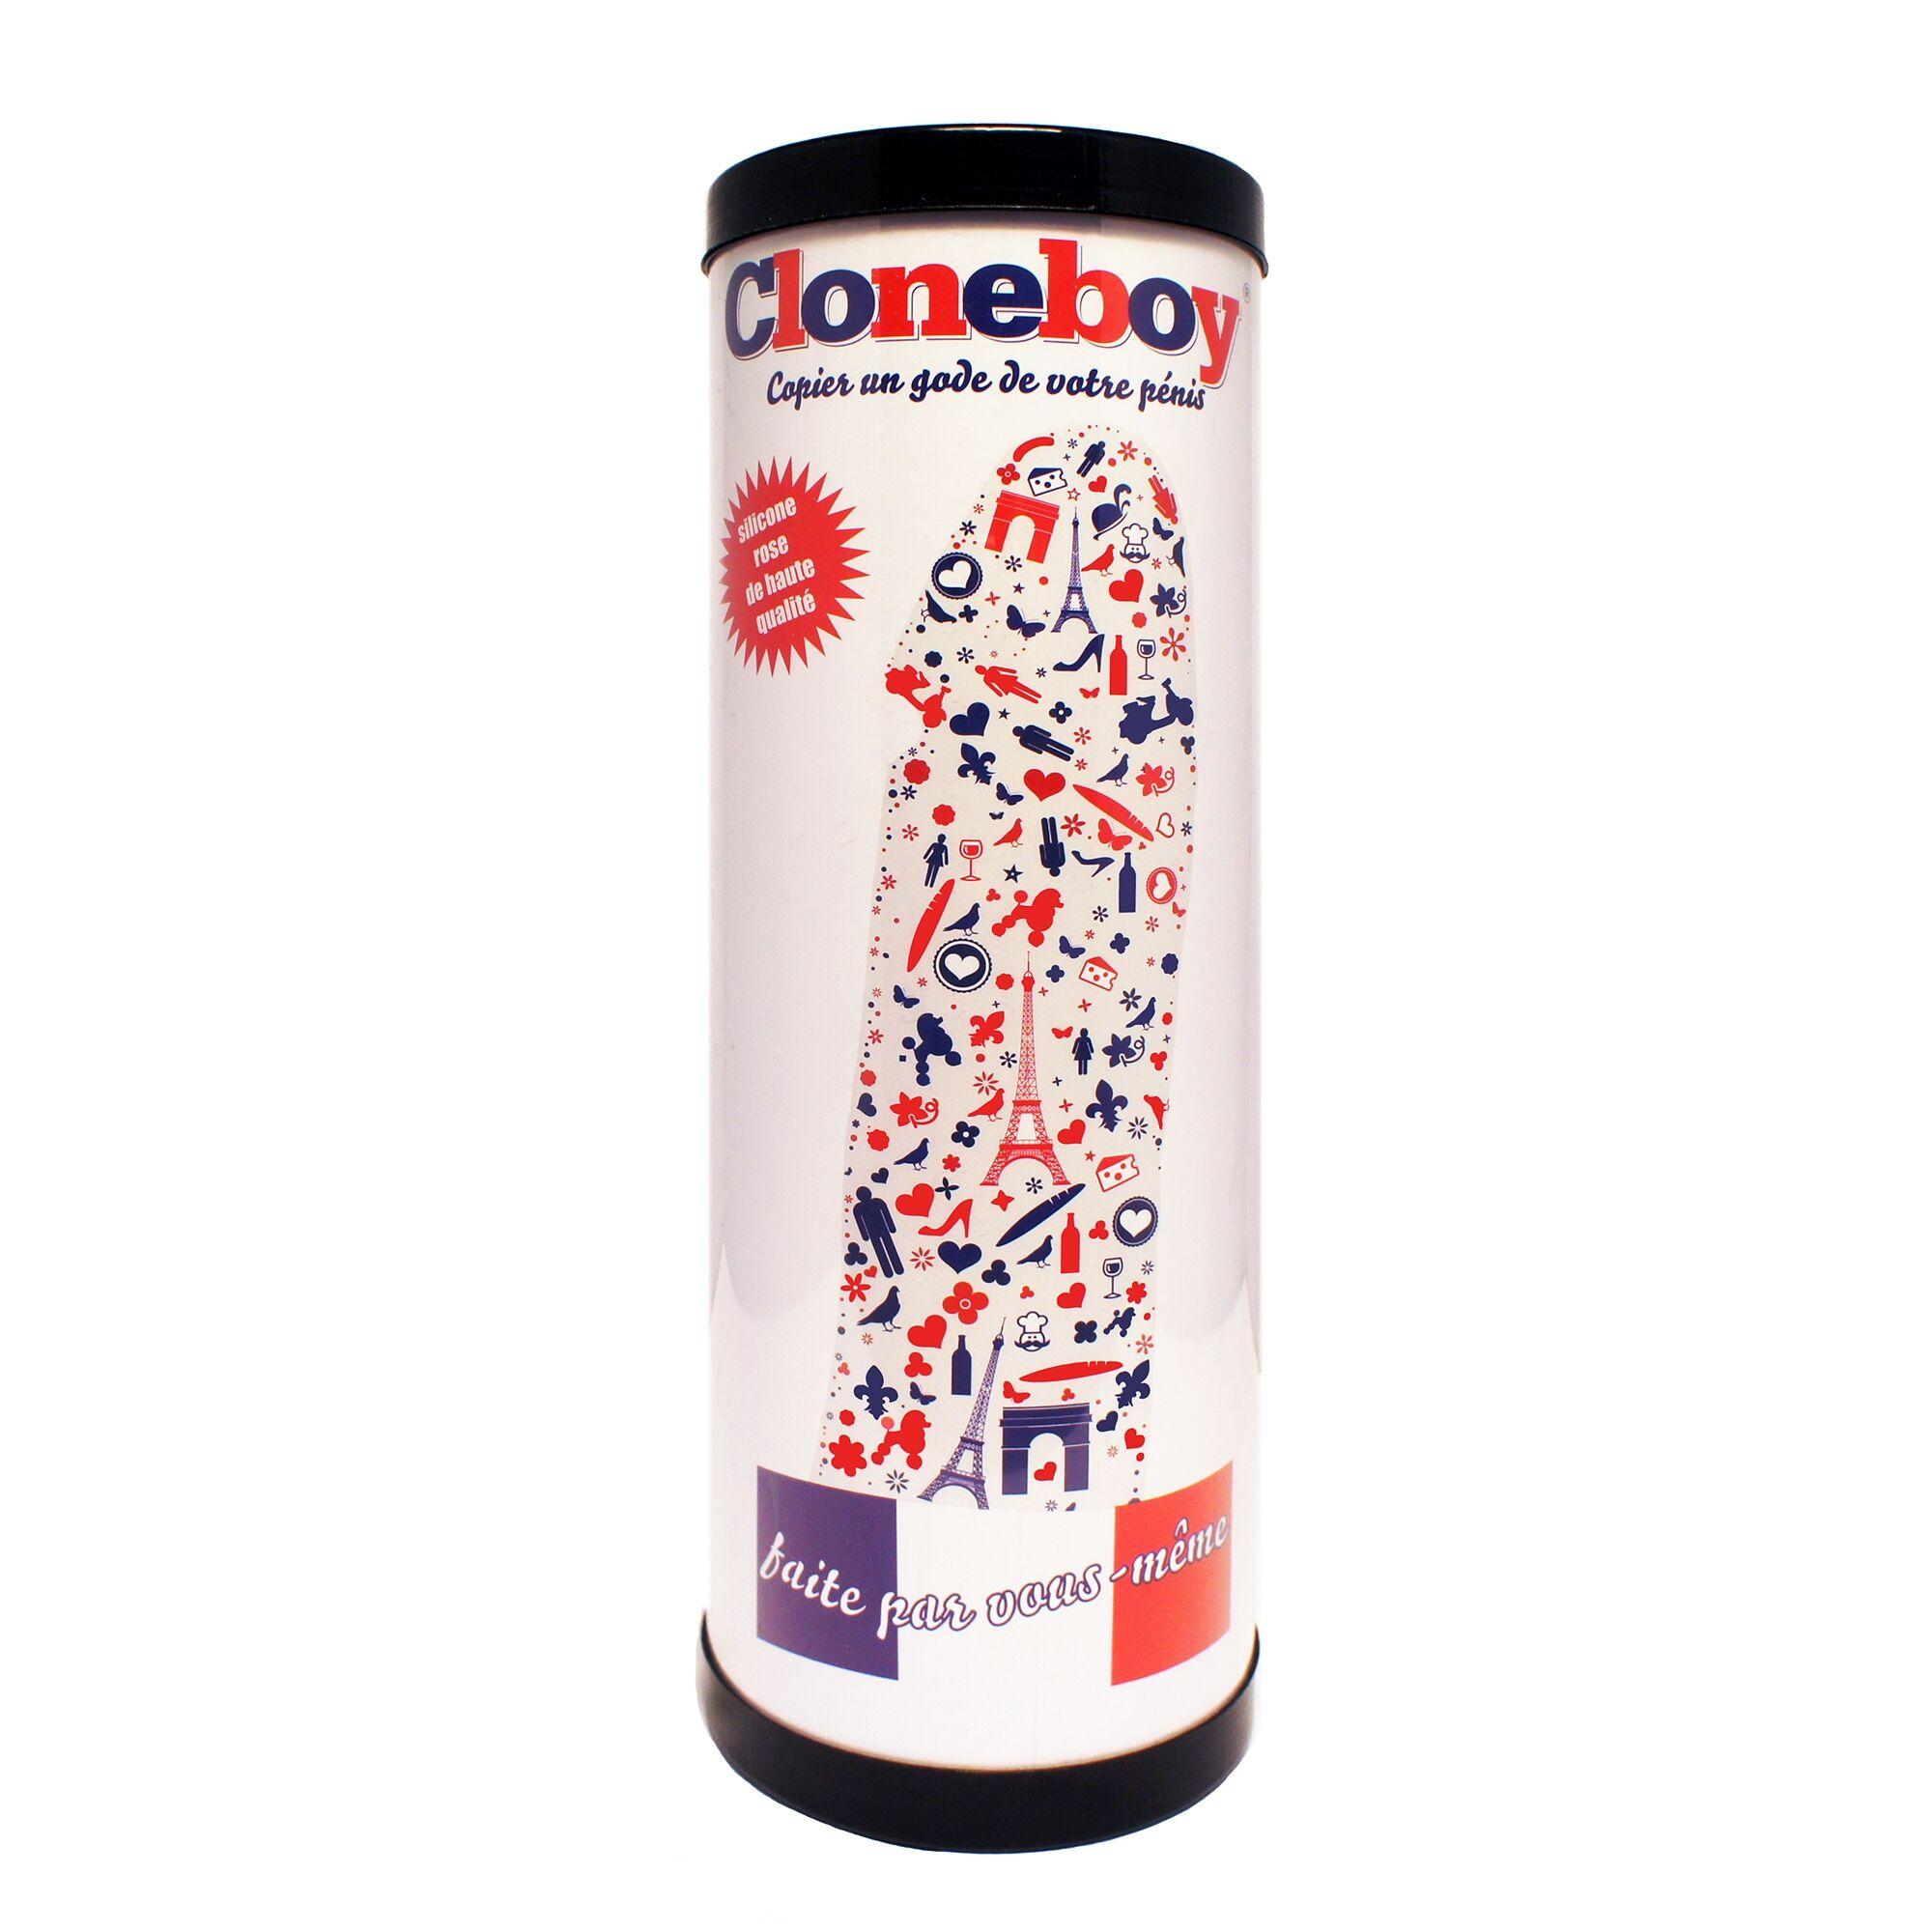 Cloneboy Gode Personnalisable Cloneboy Edition Limitée France